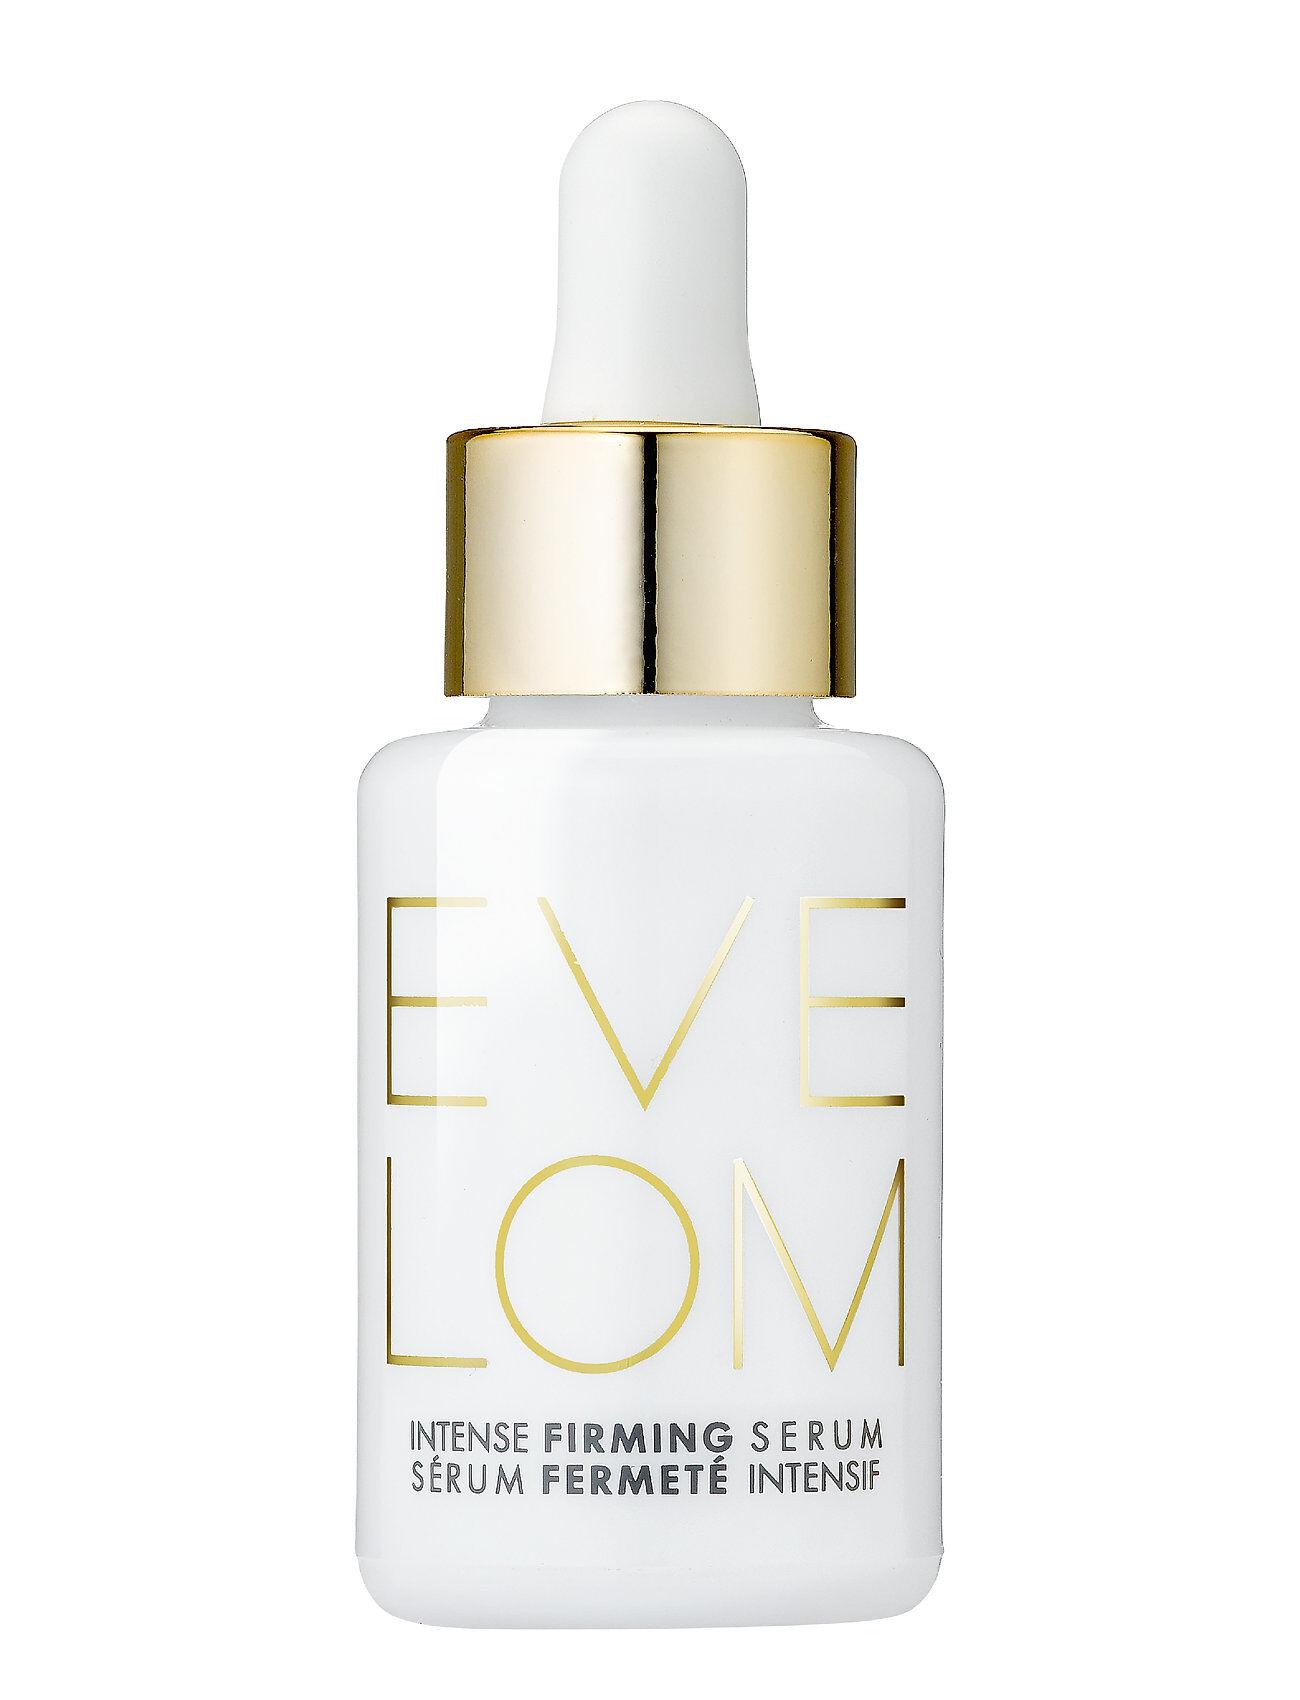 EVE LOM Intense Firming Serum